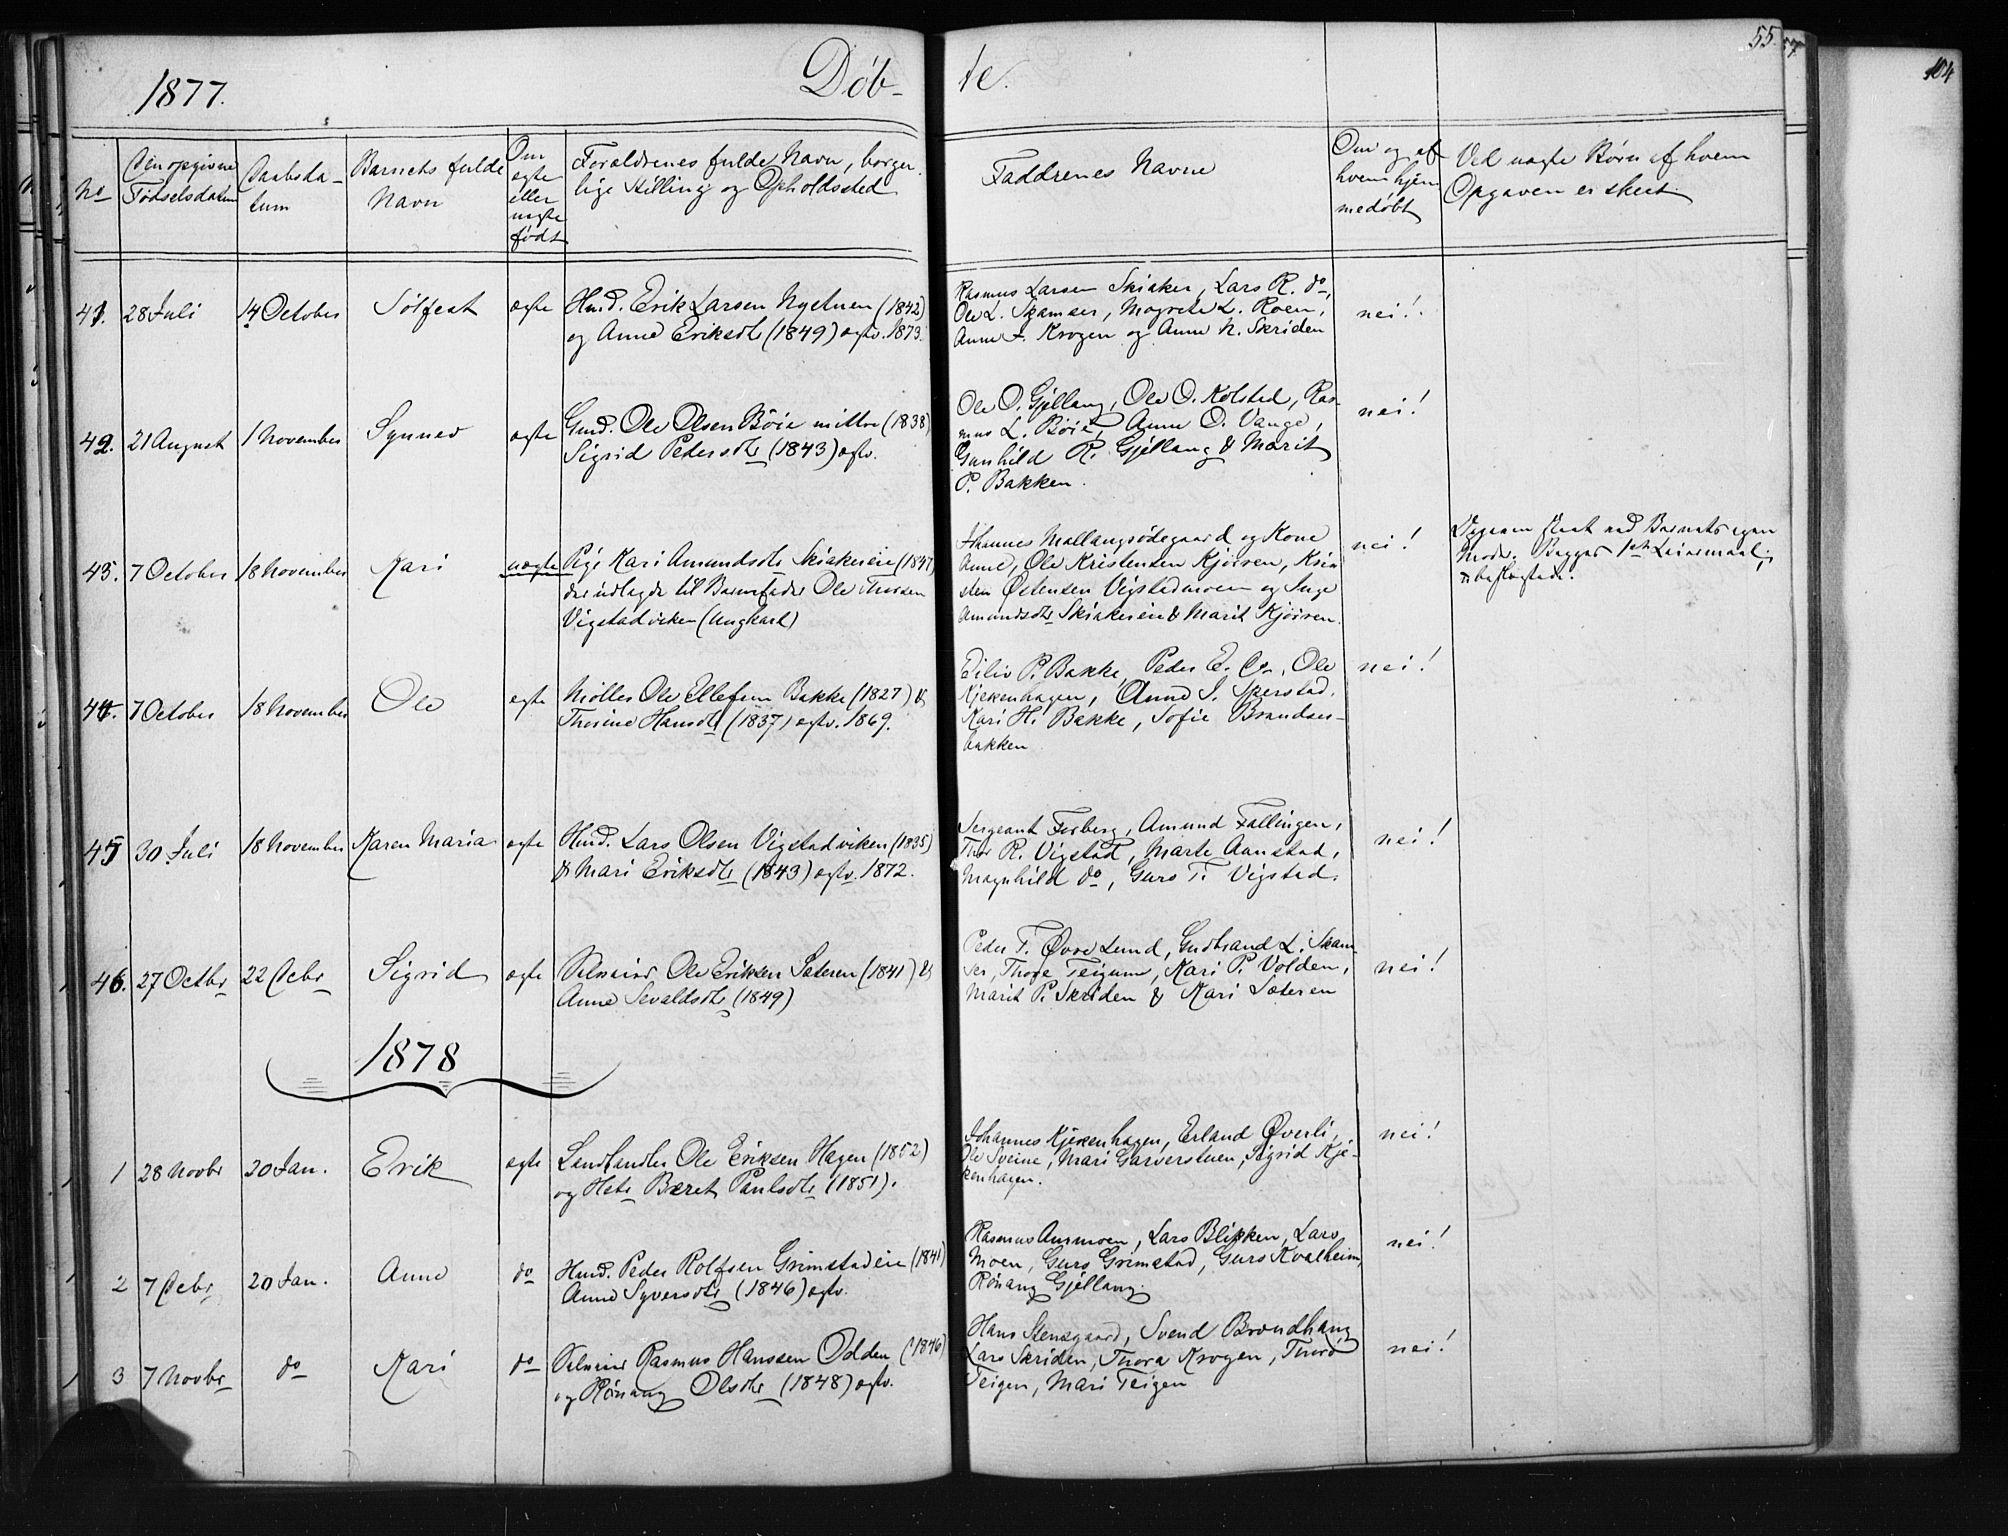 SAH, Skjåk prestekontor, Klokkerbok nr. 1, 1865-1893, s. 55